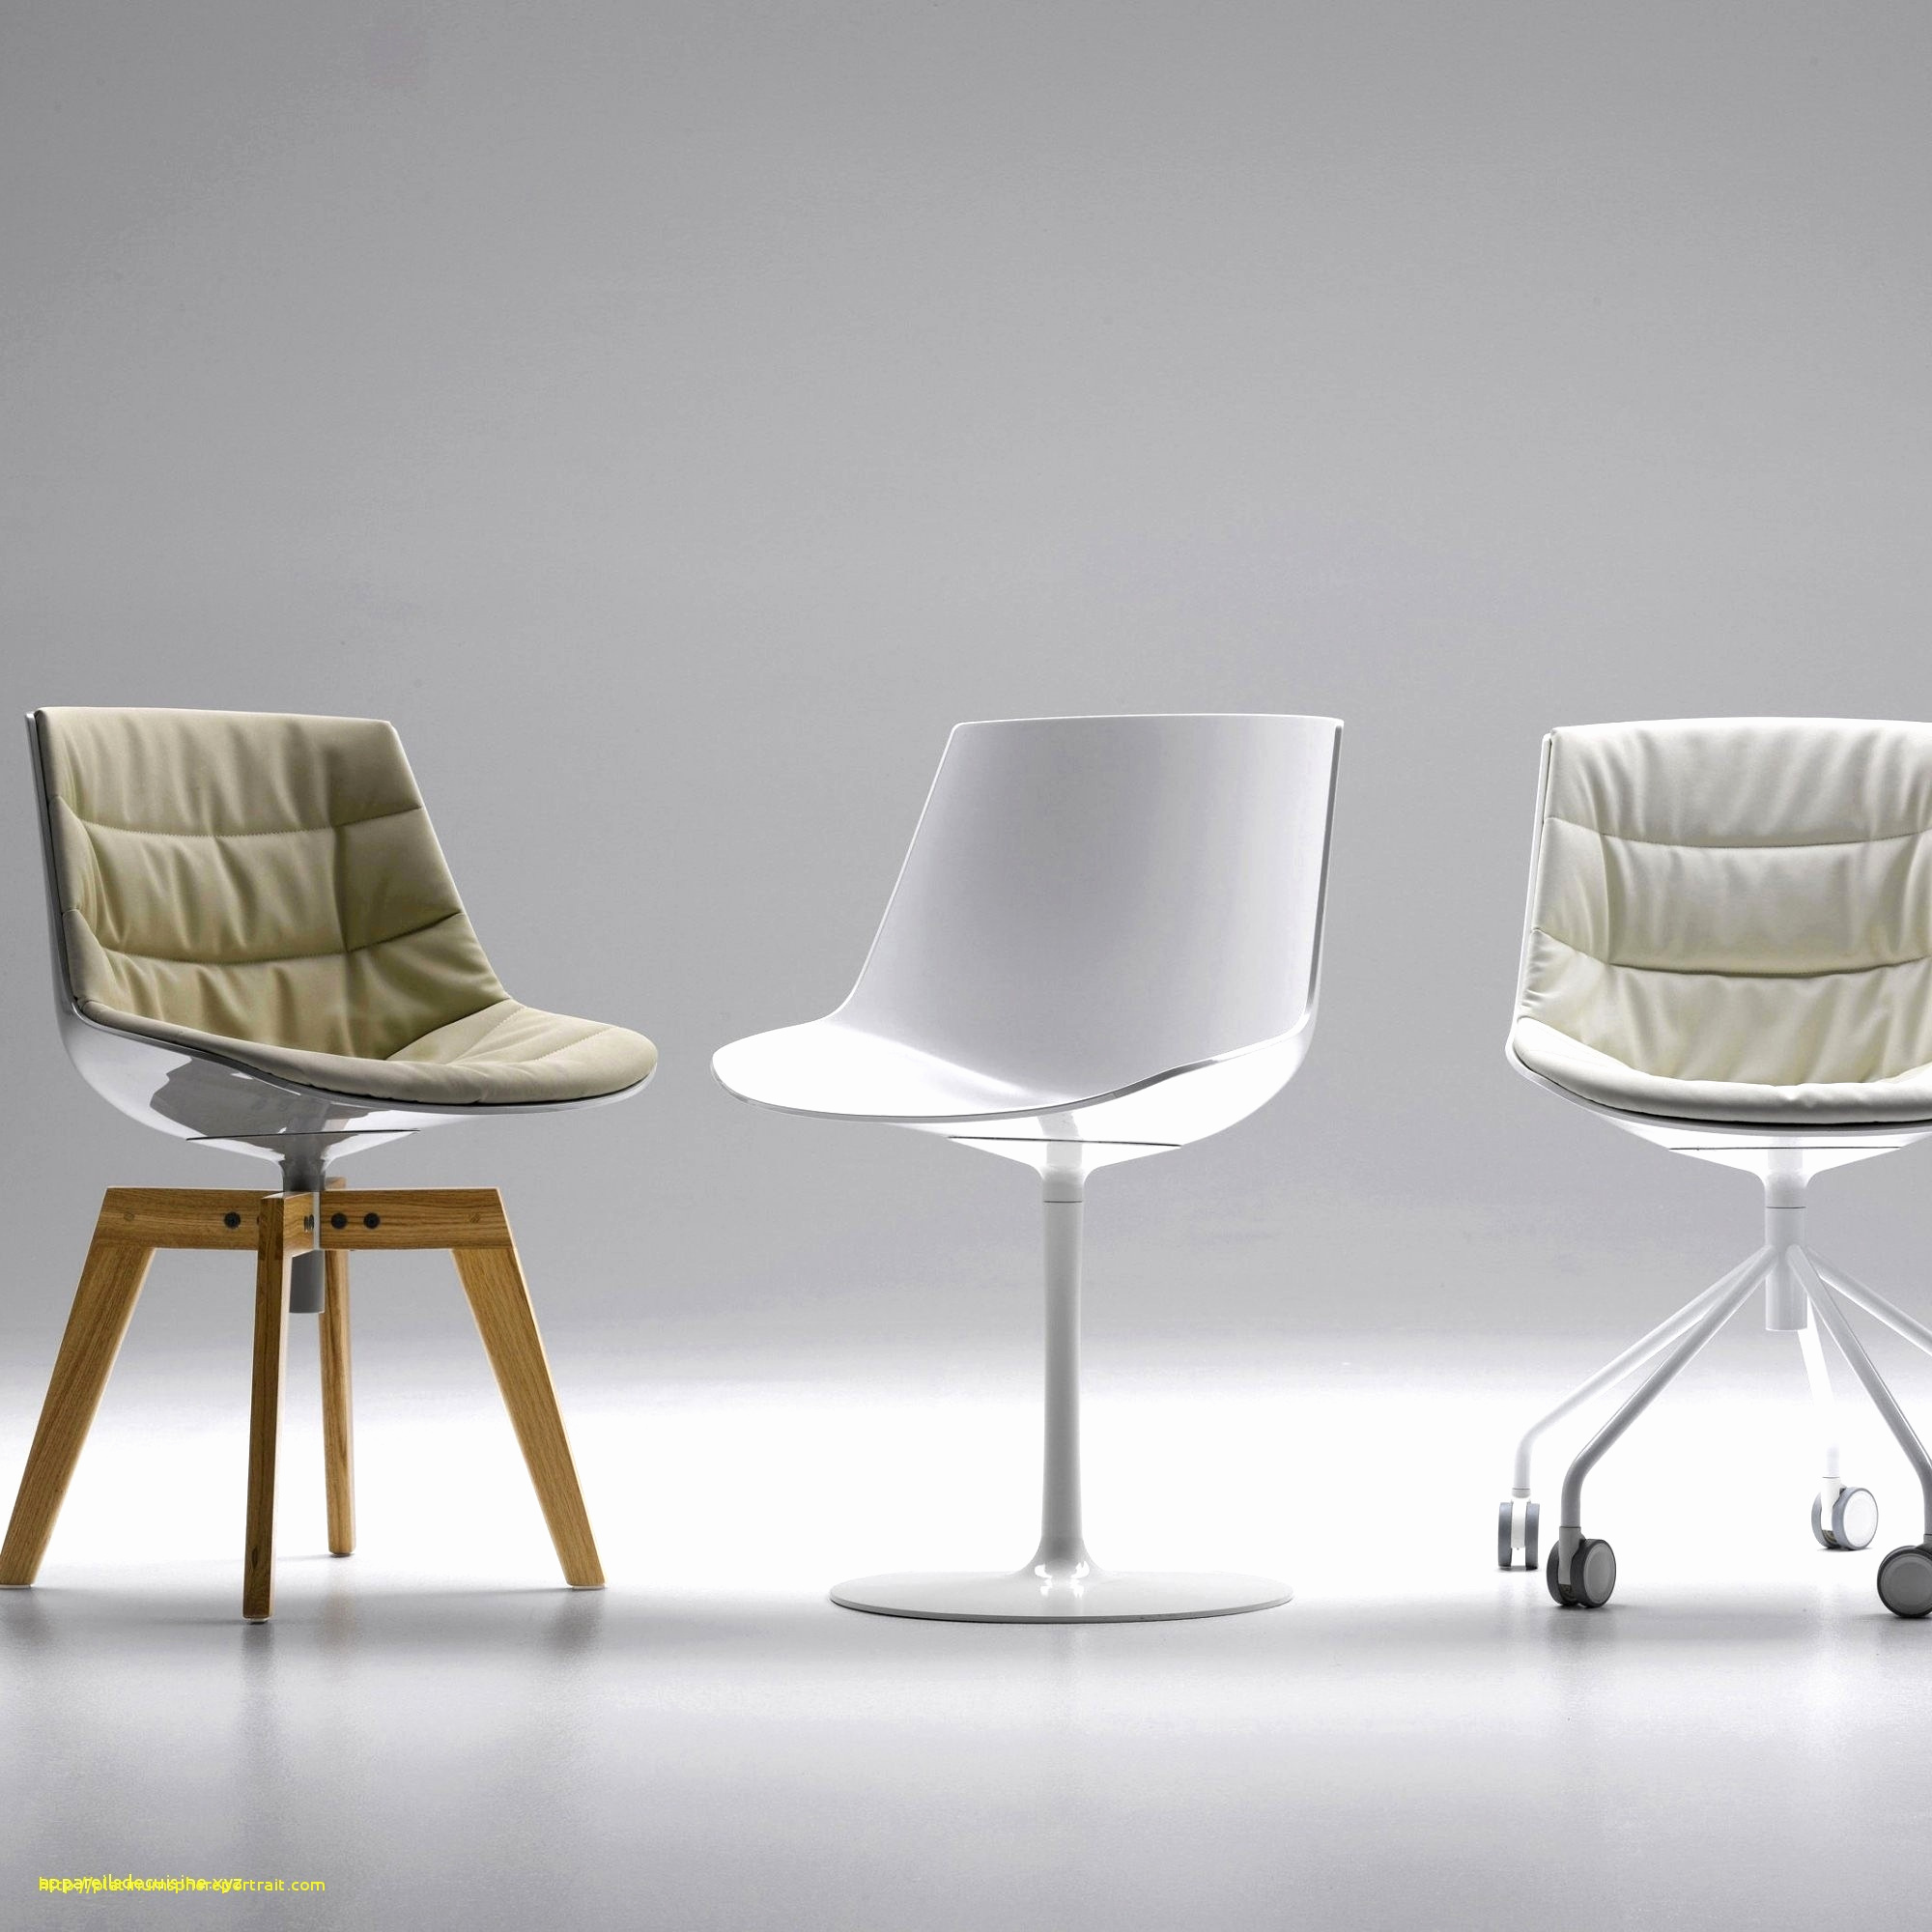 table de massage pliante source dinspiration chaise pliante design table pliante design best chaise de massage of table de massage pliante